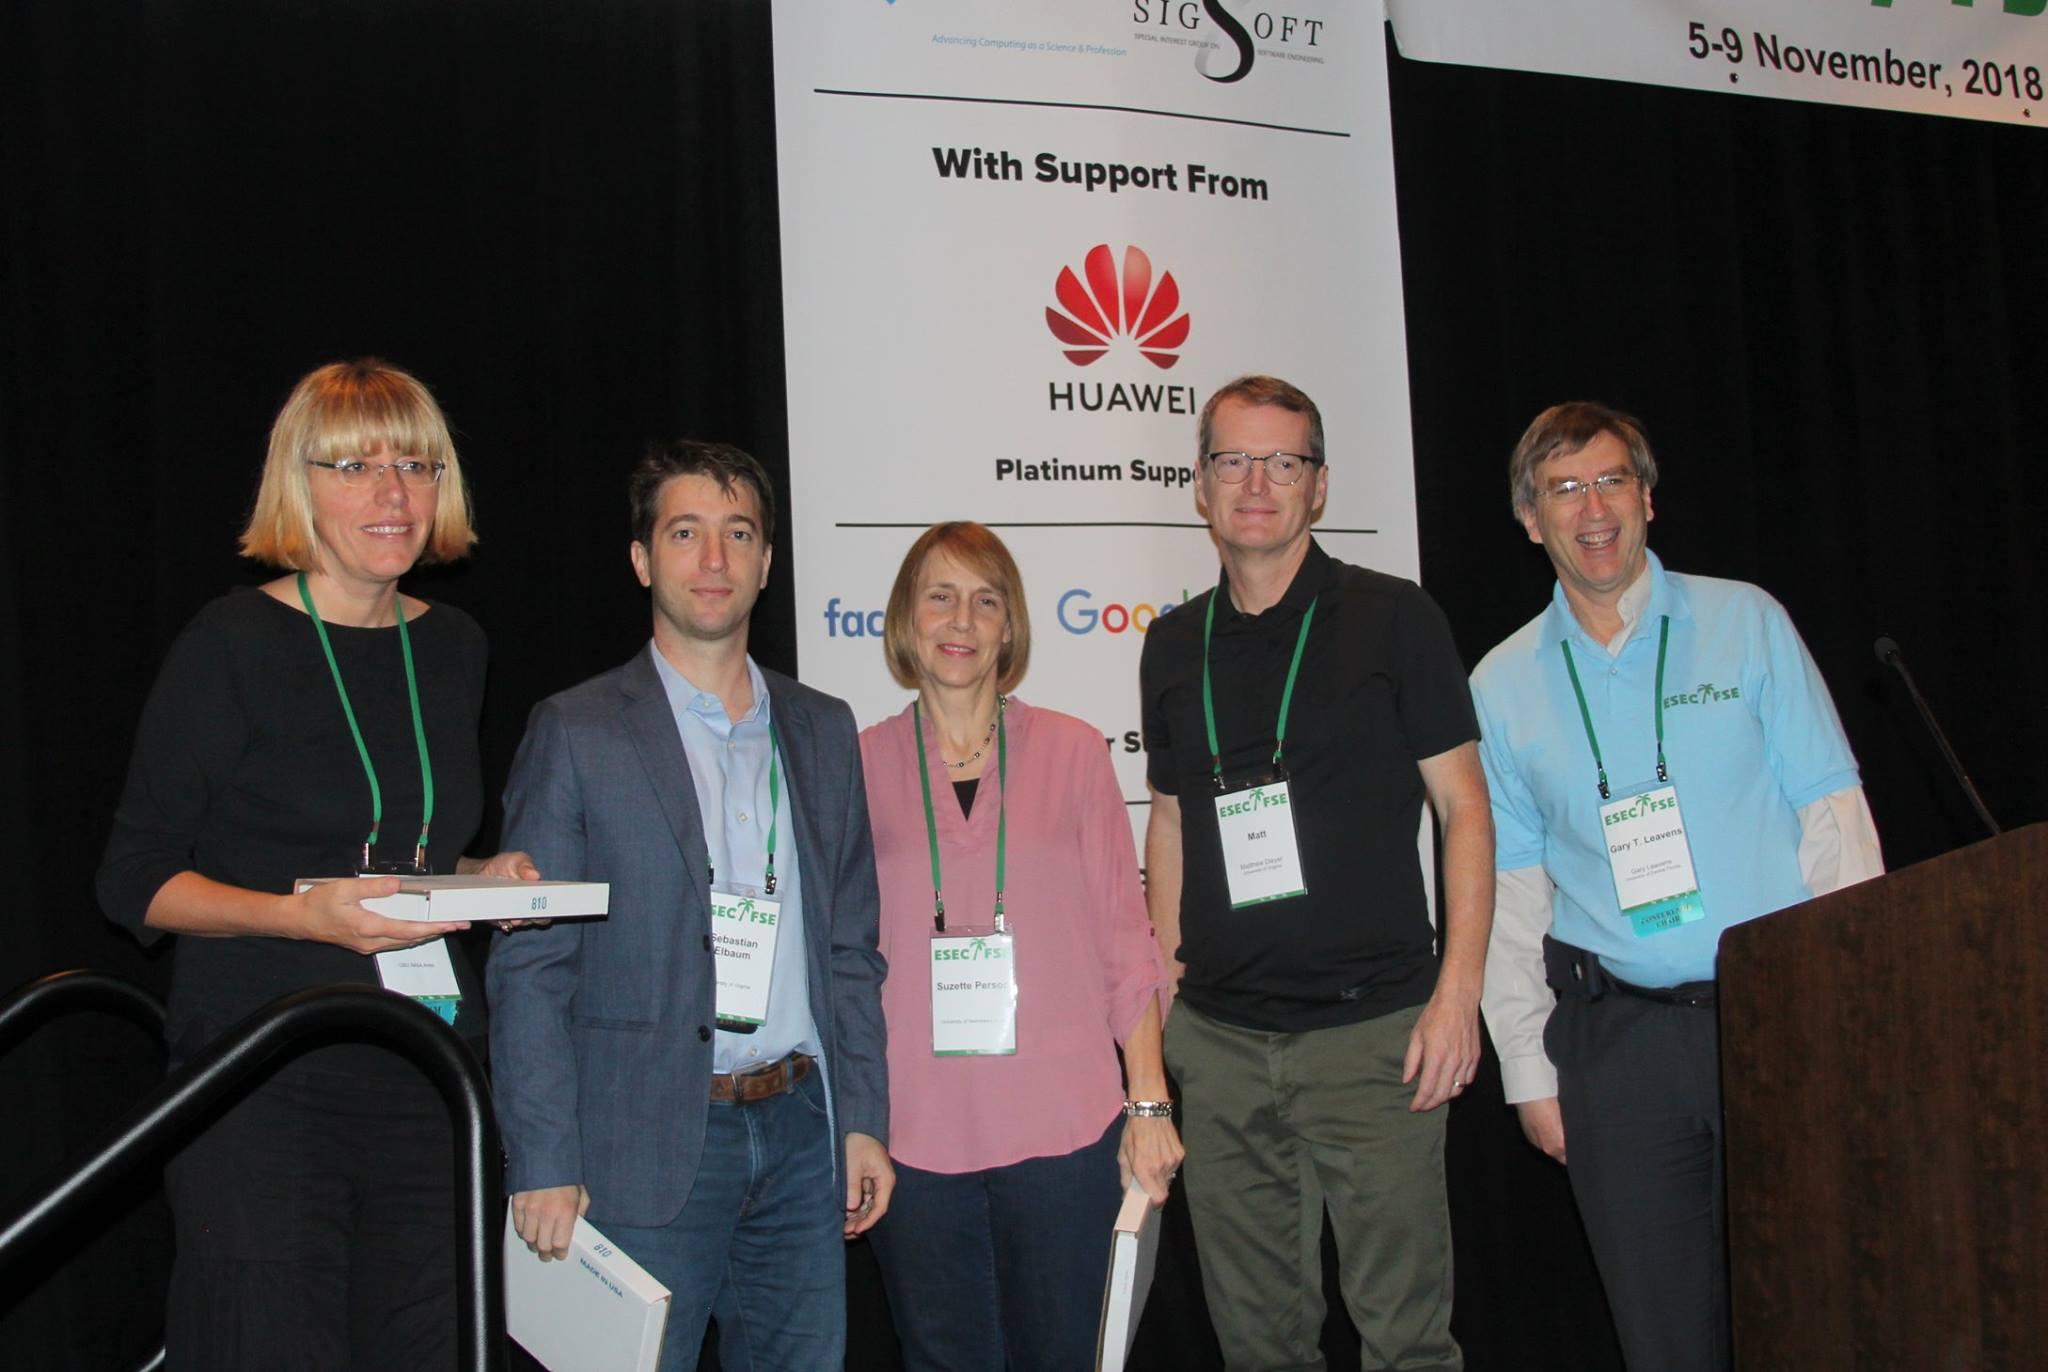 From left to right: Corina S. Pǎsǎreanu, Sebastian Elbaum, Suzette Person, Matthew Dwyer, and Gary Leavens.